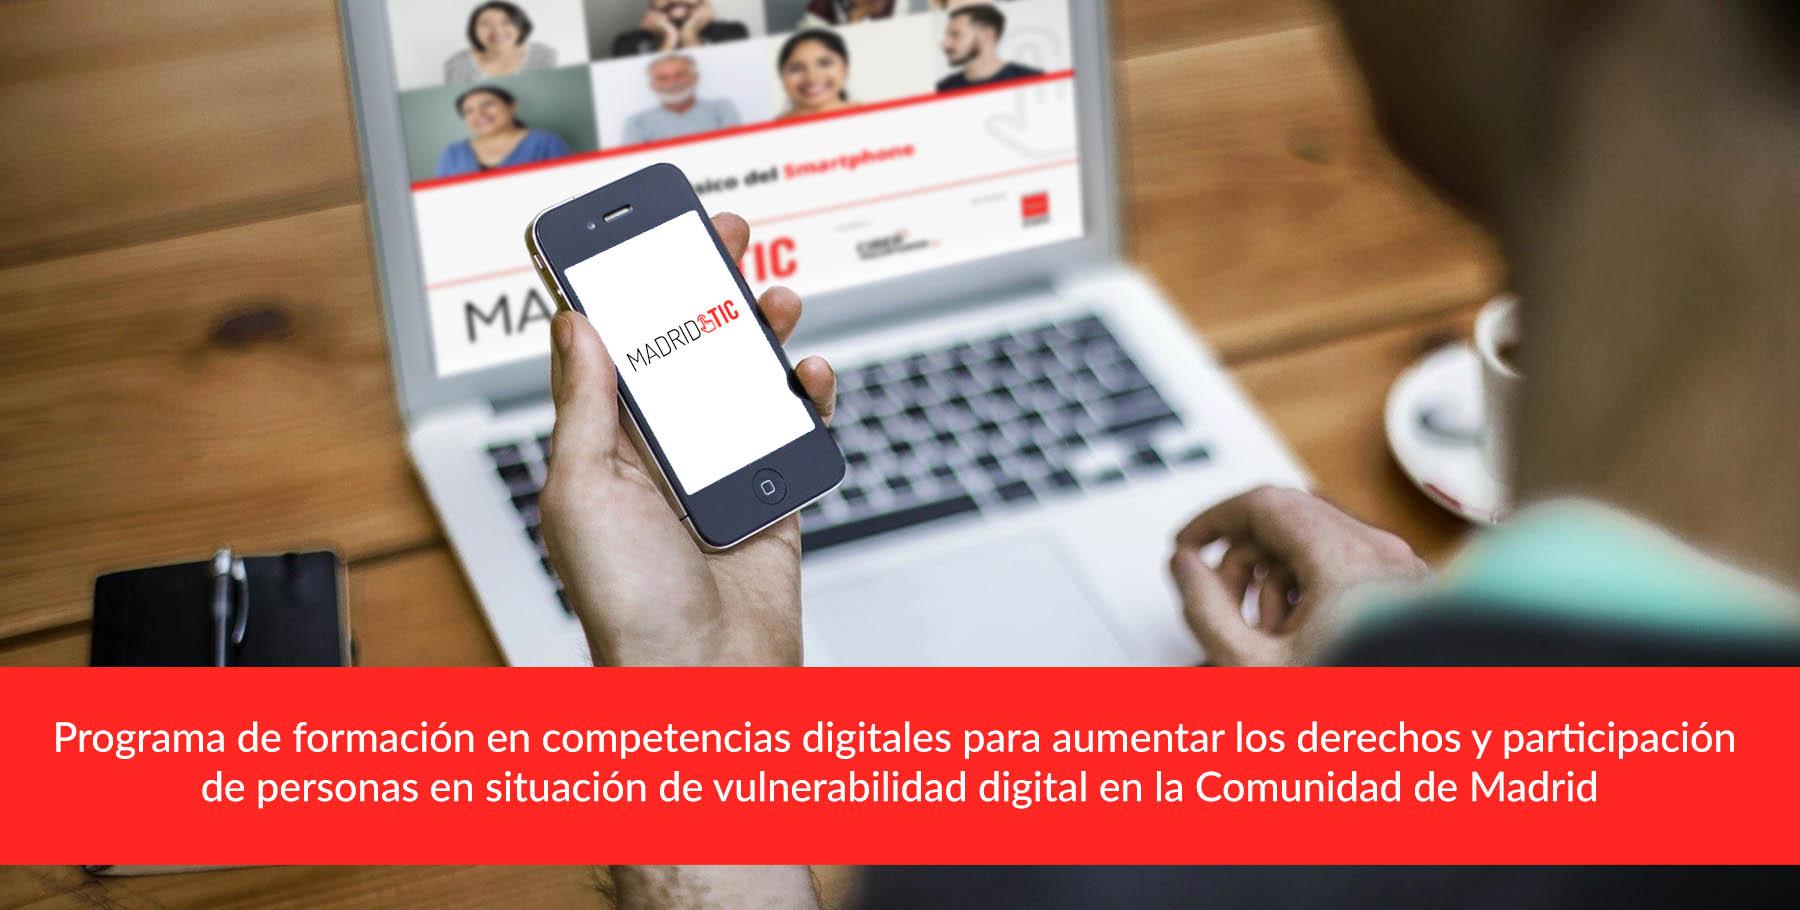 Primera ciberformación con Grupo 5 Residencia Alcobendas: Iniciación al smartphone